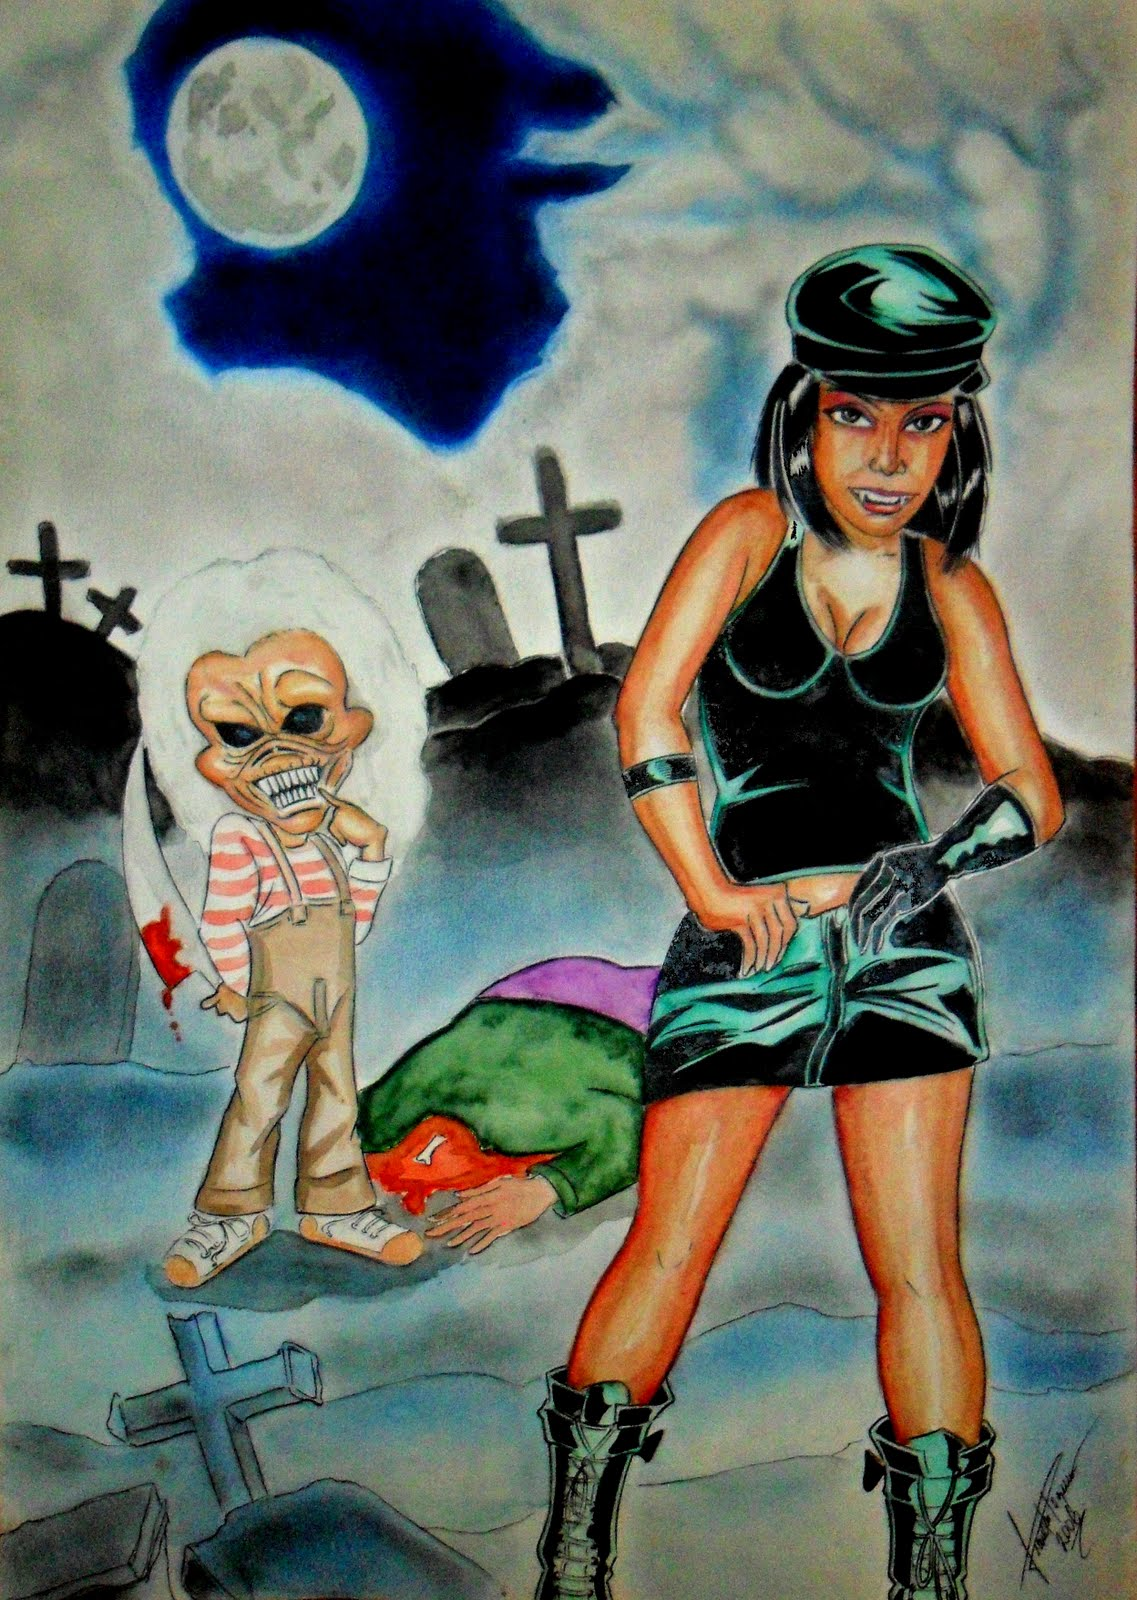 Jack Boneco Assassino Complete guilda de desenhistas: o mascote da banda iron maiden, eddie na